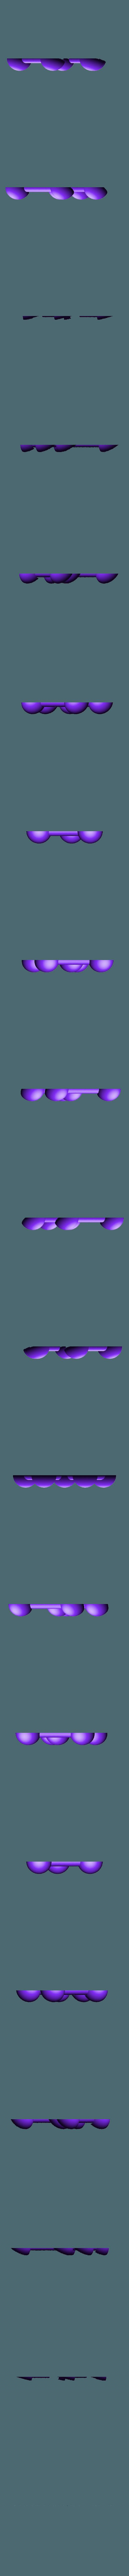 Manchete_split_01.stl Download free STL file Rede Manchete logo • 3D printer design, CapAwsome